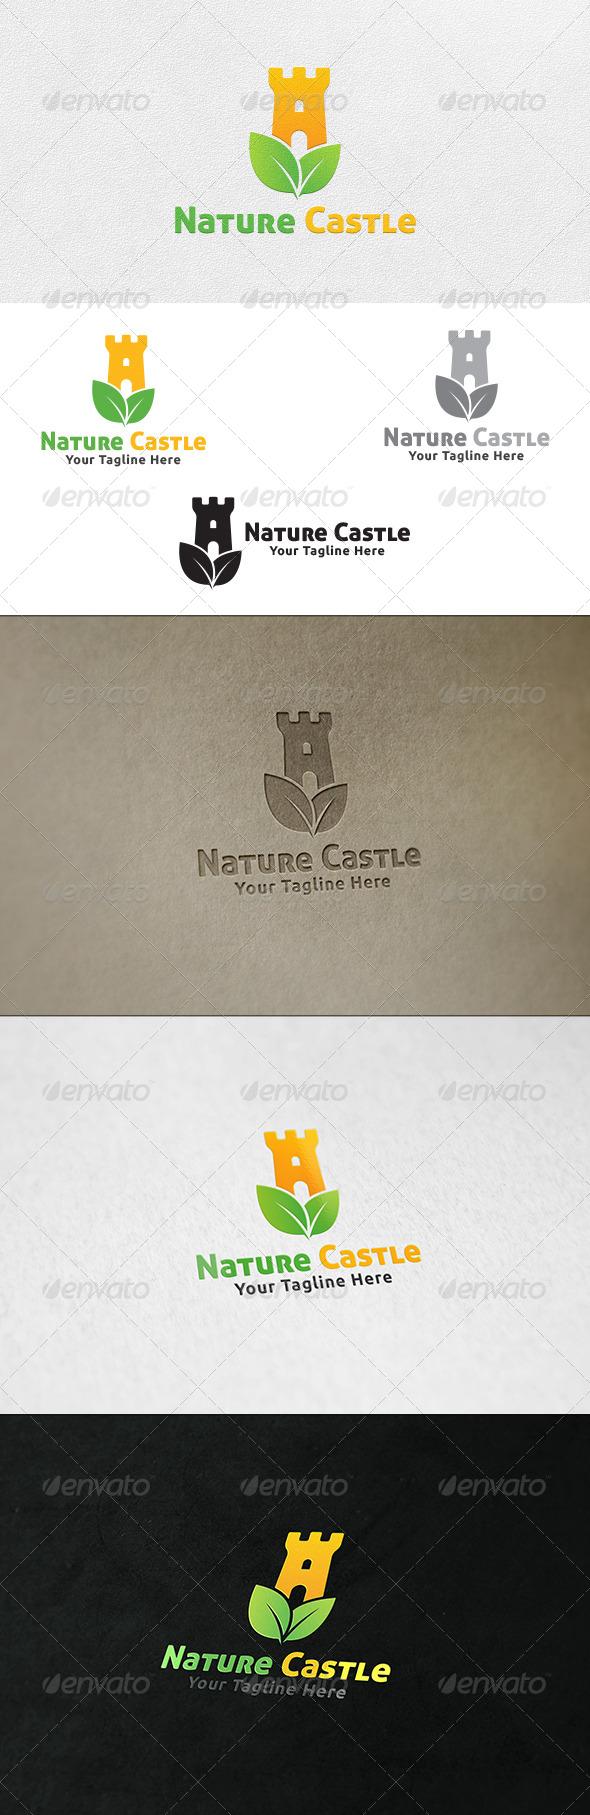 Nature Castle - Logo Template - Symbols Logo Templates